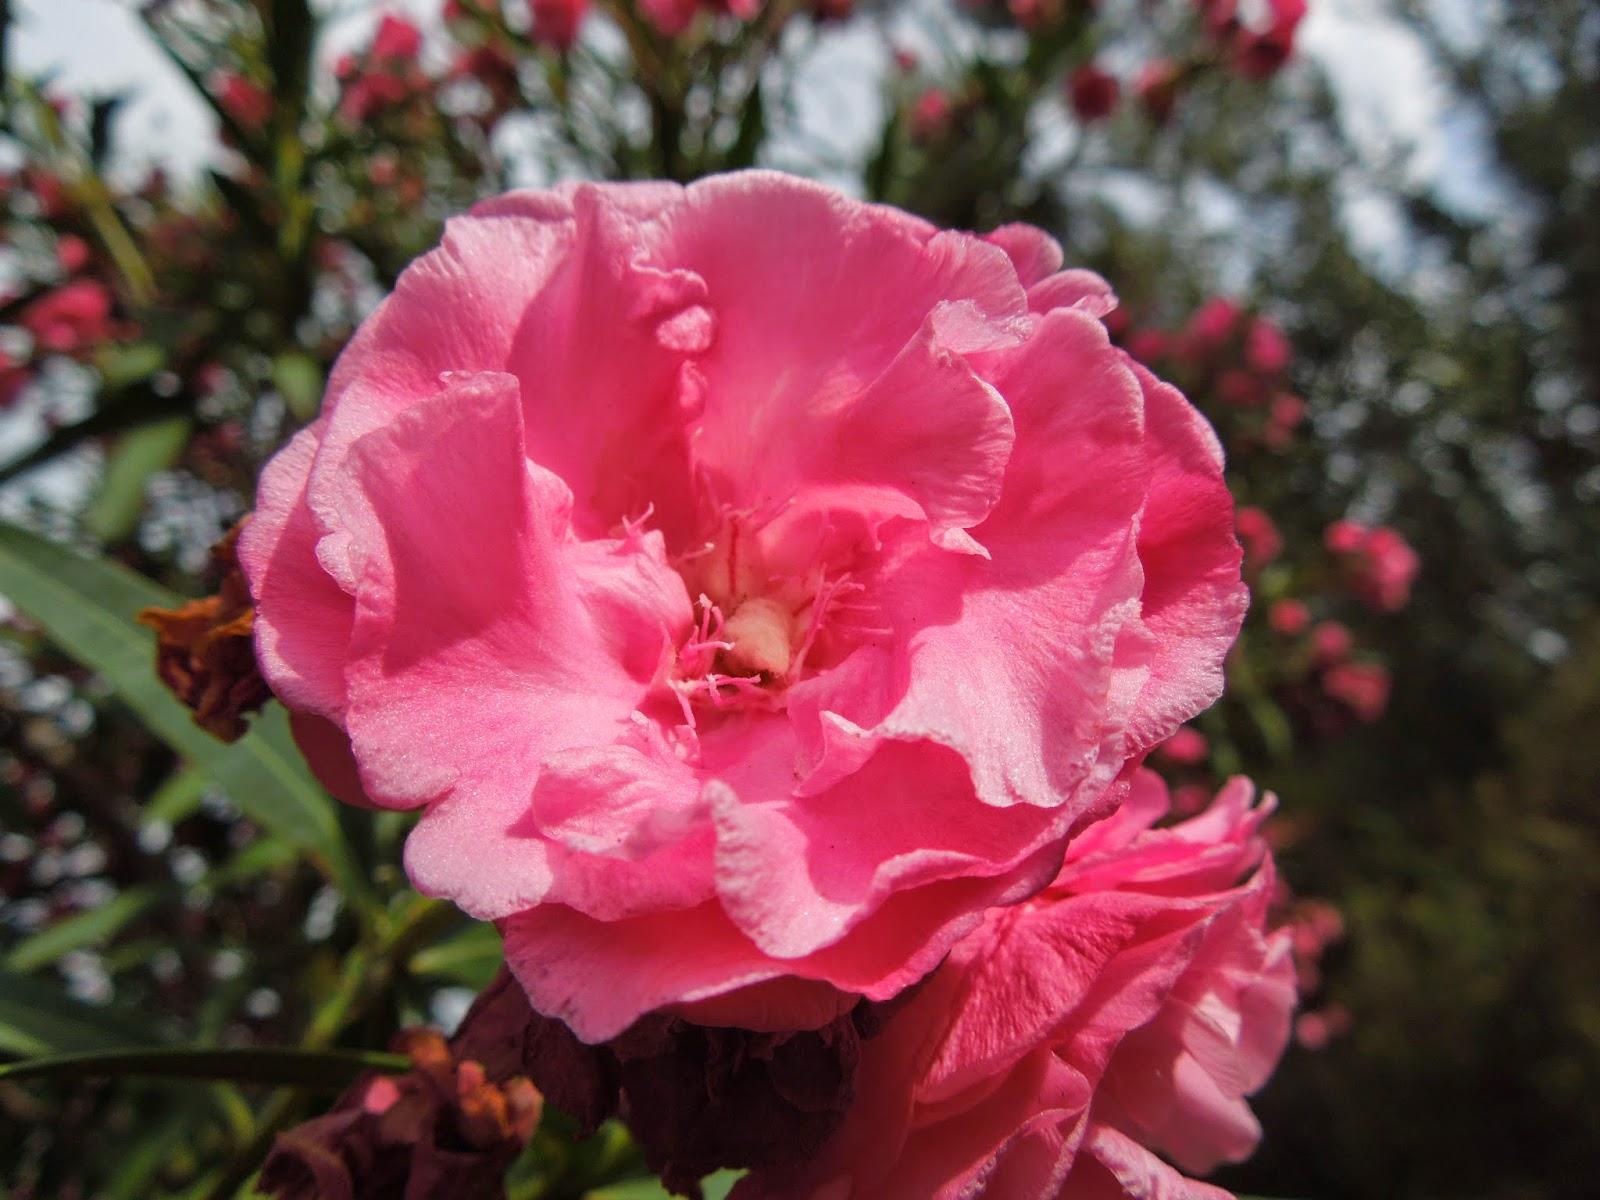 Adelfas de tres colores bot nic serrat - Rosas chinas ...